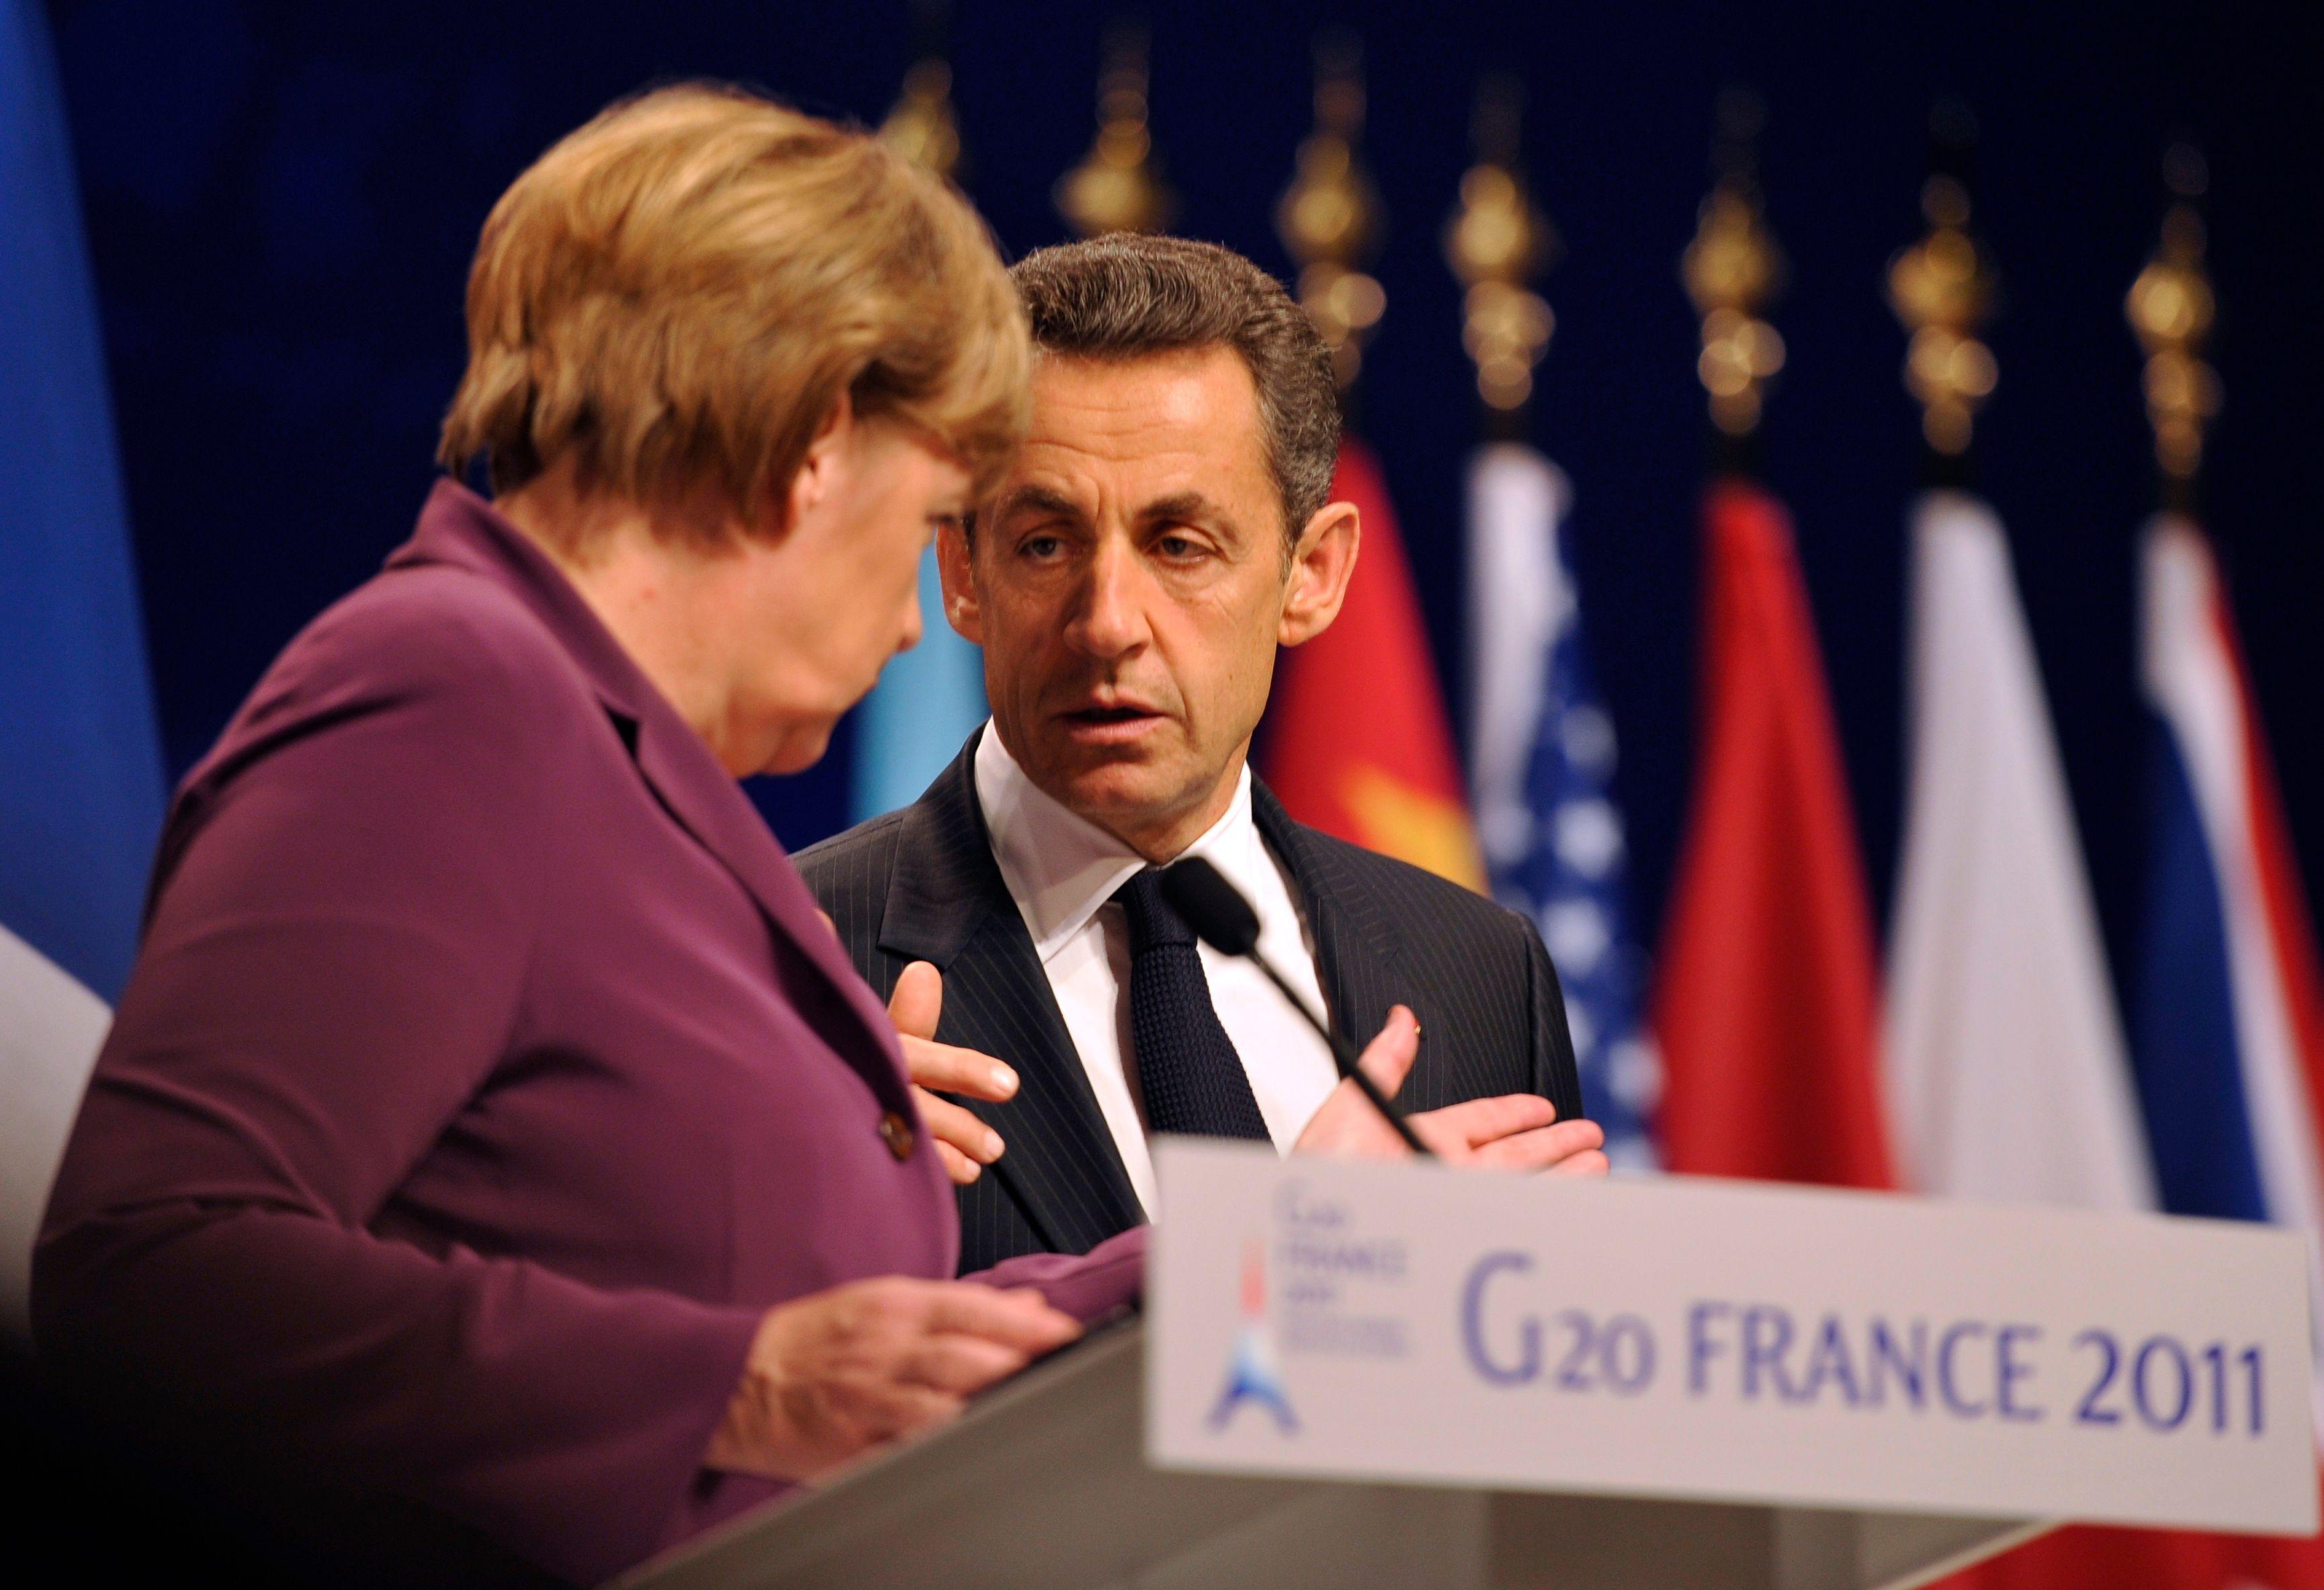 Nicolas Sarkozy et Angela Merkel devraient prochainement se revoir